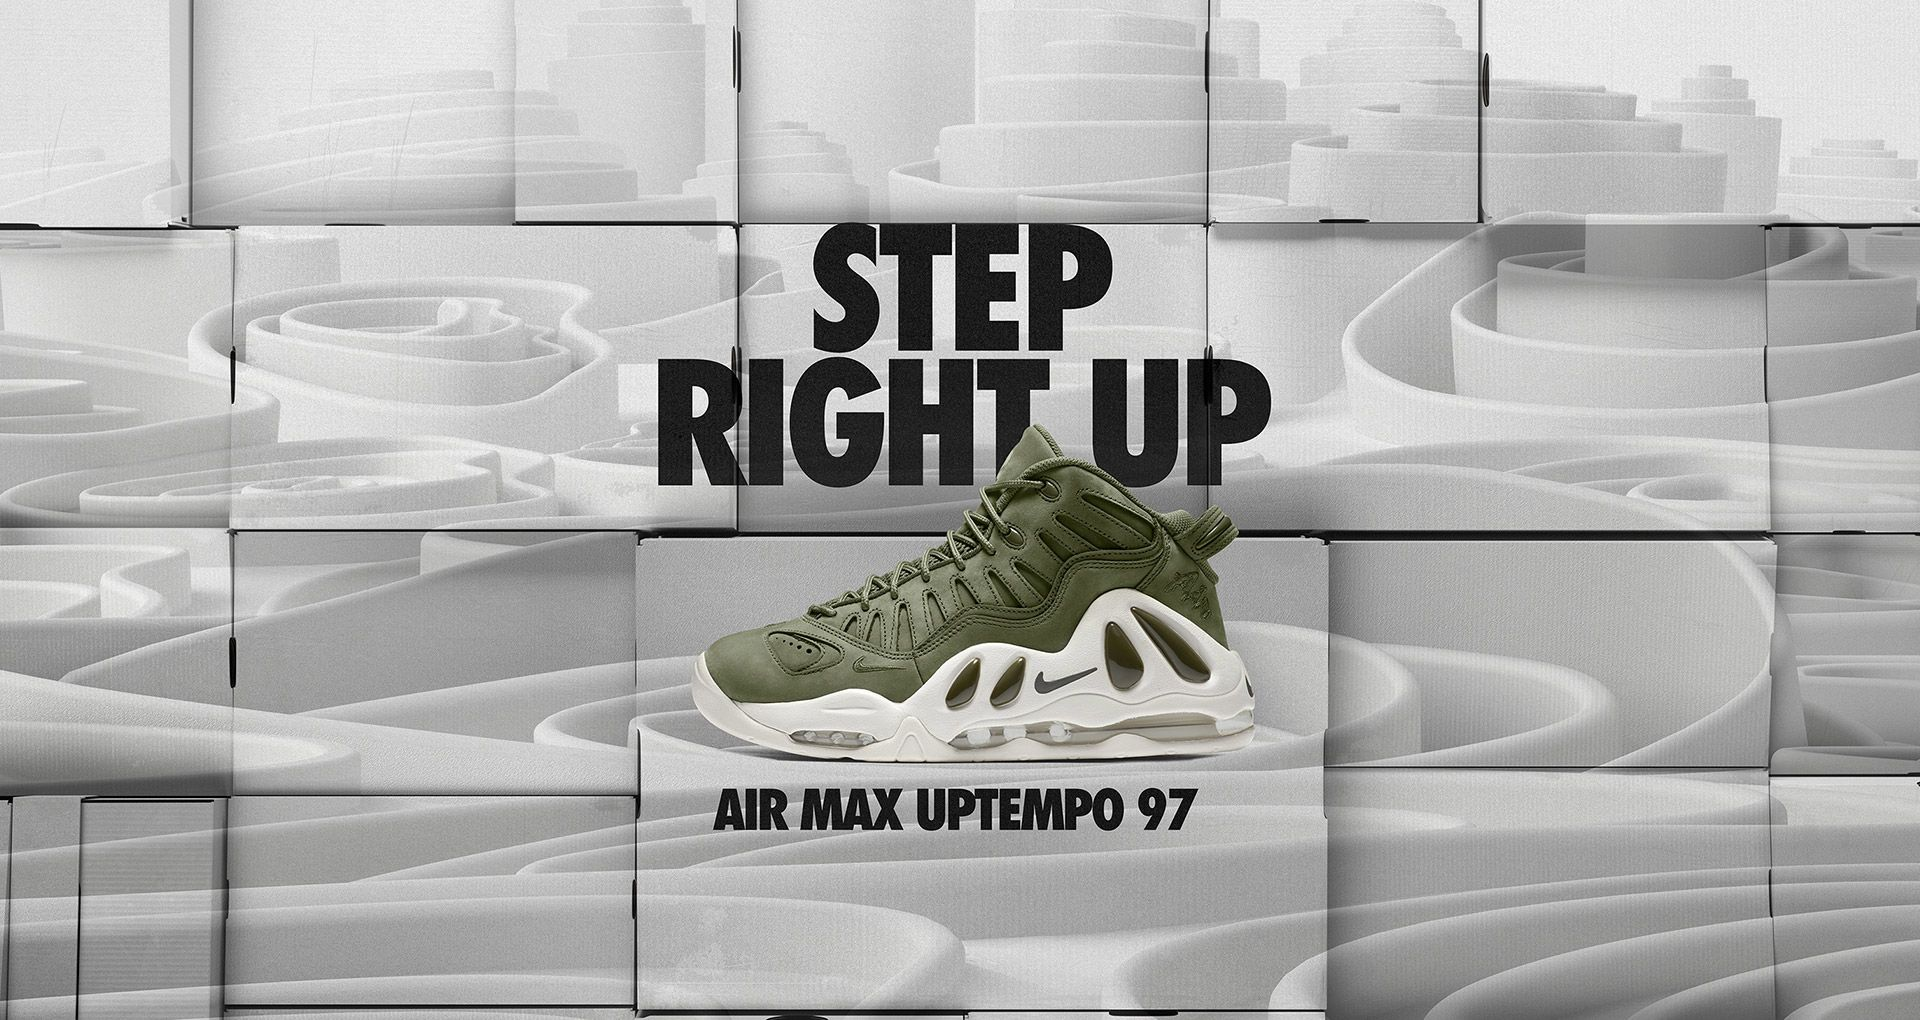 Nike Air Max Uptempo 97 (Urban Haze Urban Haze White)